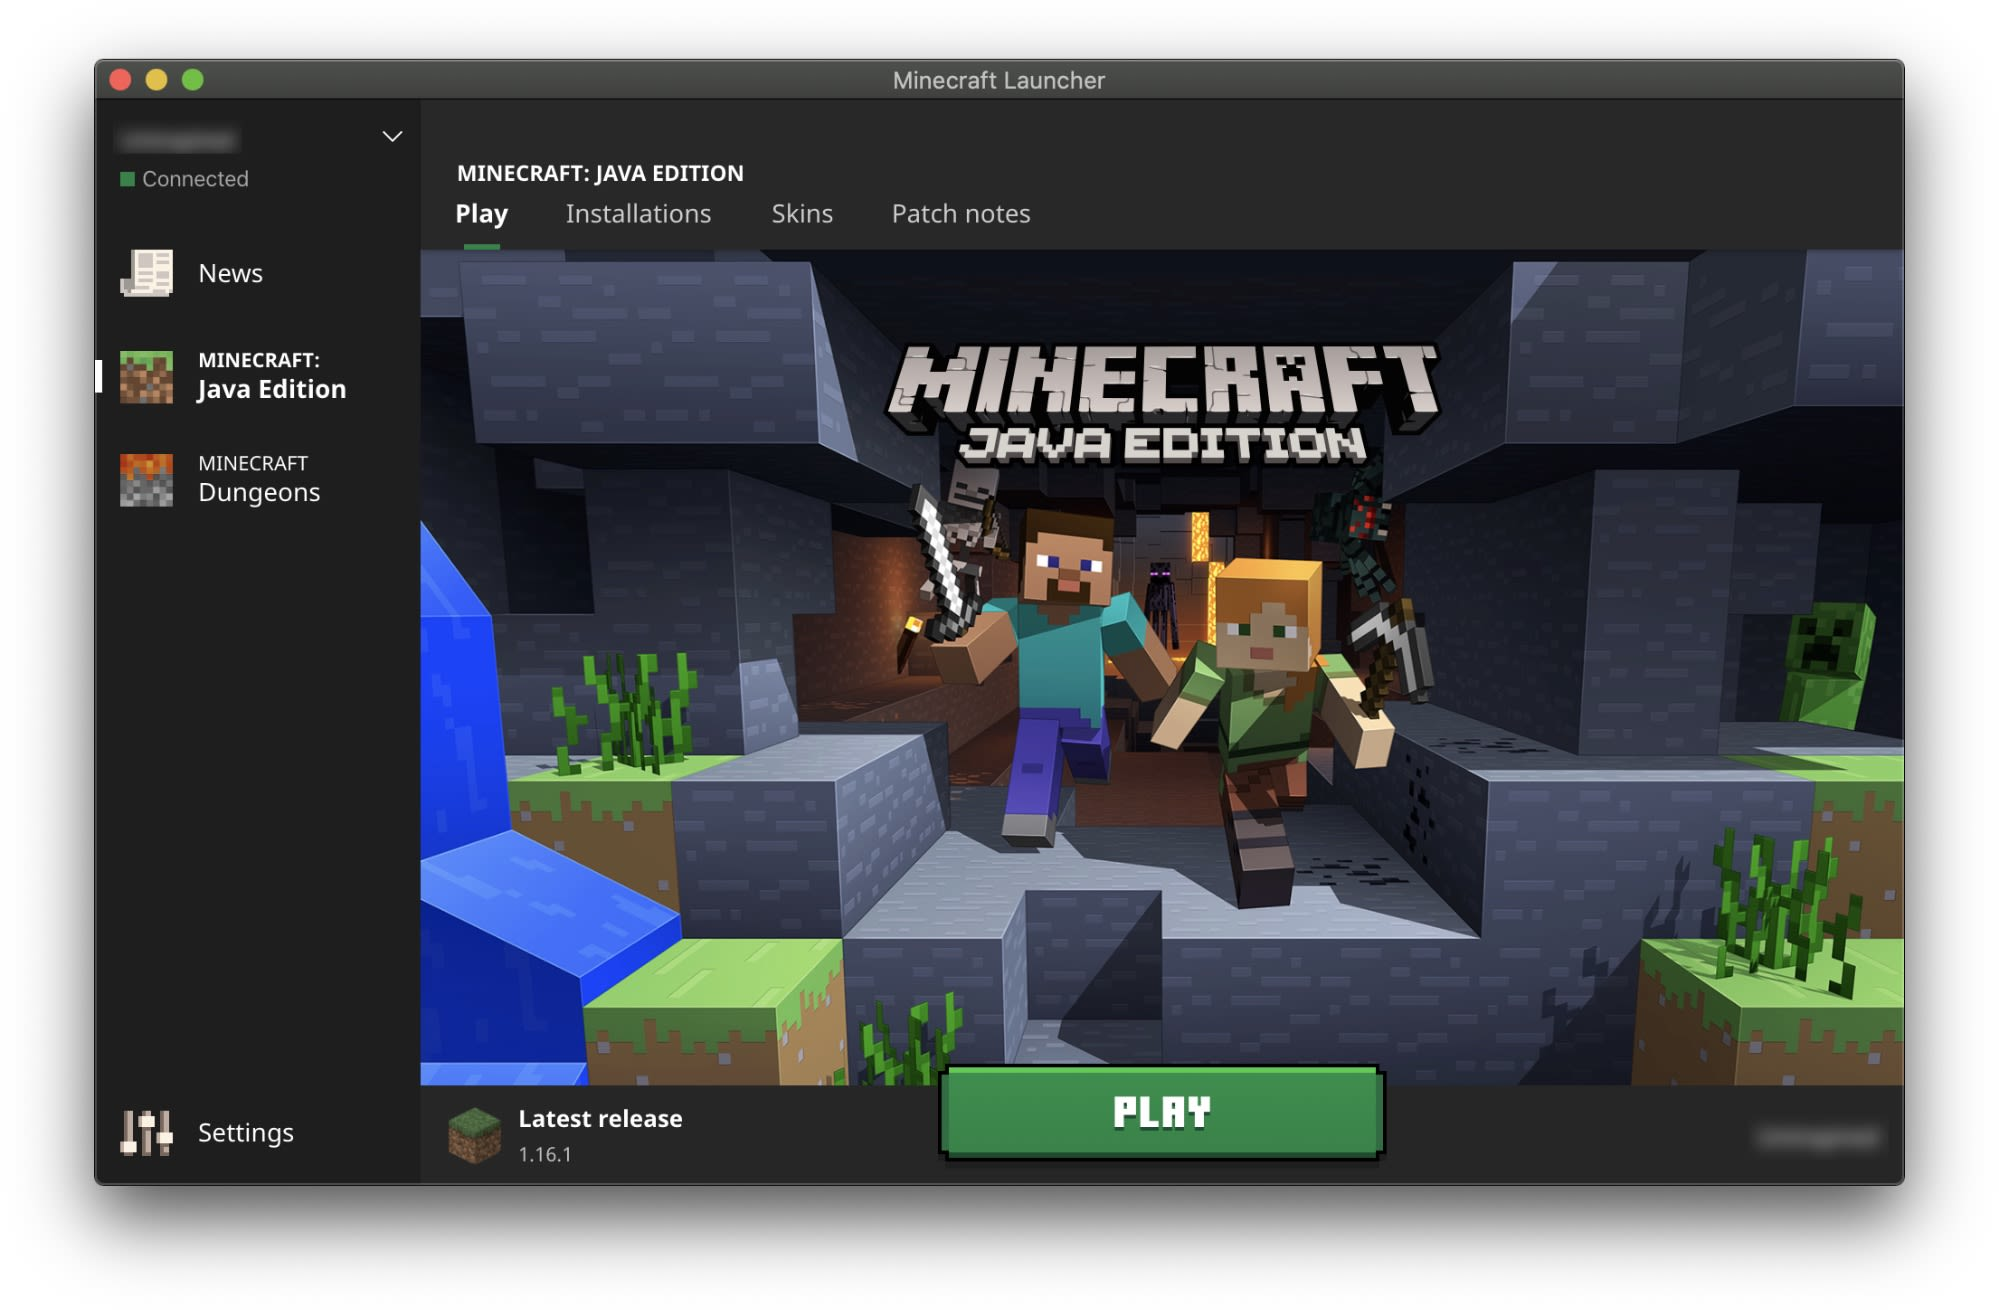 The Minecraft launcher